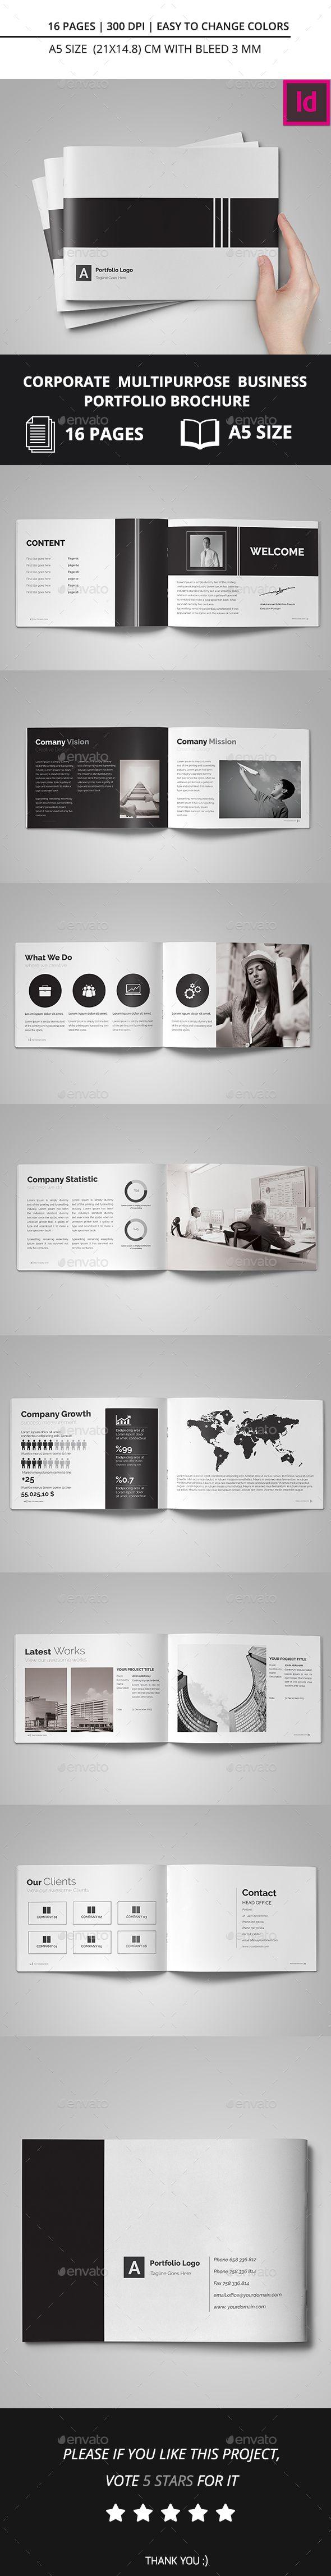 Corporate Multipurpose Business Portfolio Brochure Template InDesign INDD #design Download: http://graphicriver.net/item/corporate-multipurpose-business-portfolio-brochure/14059216?ref=ksioks